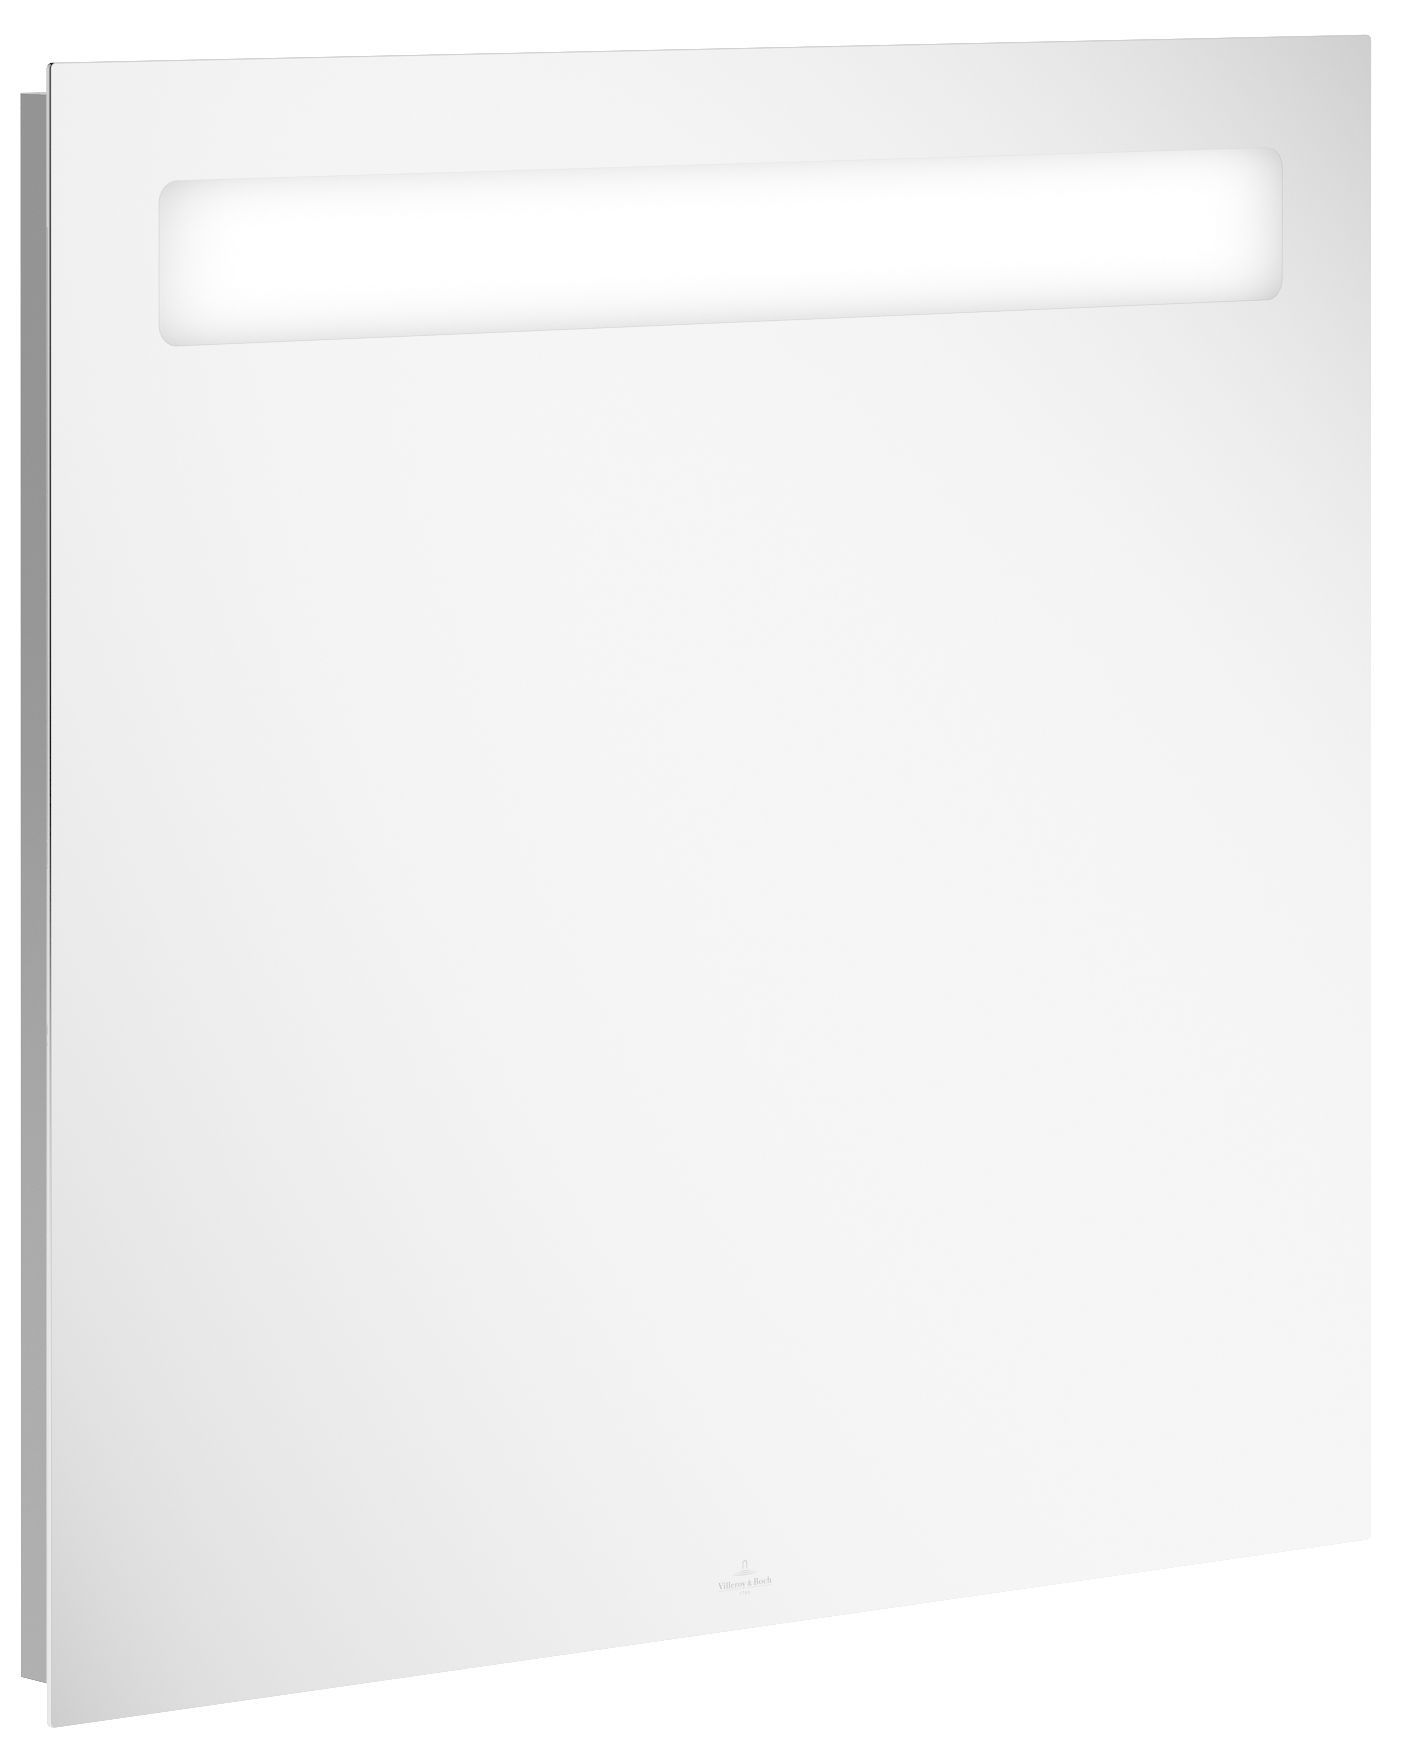 Villeroy & Boch More to See 14 Spiegel mit Beleuchtung  B:90xH:75xT:4,7cm A4329000